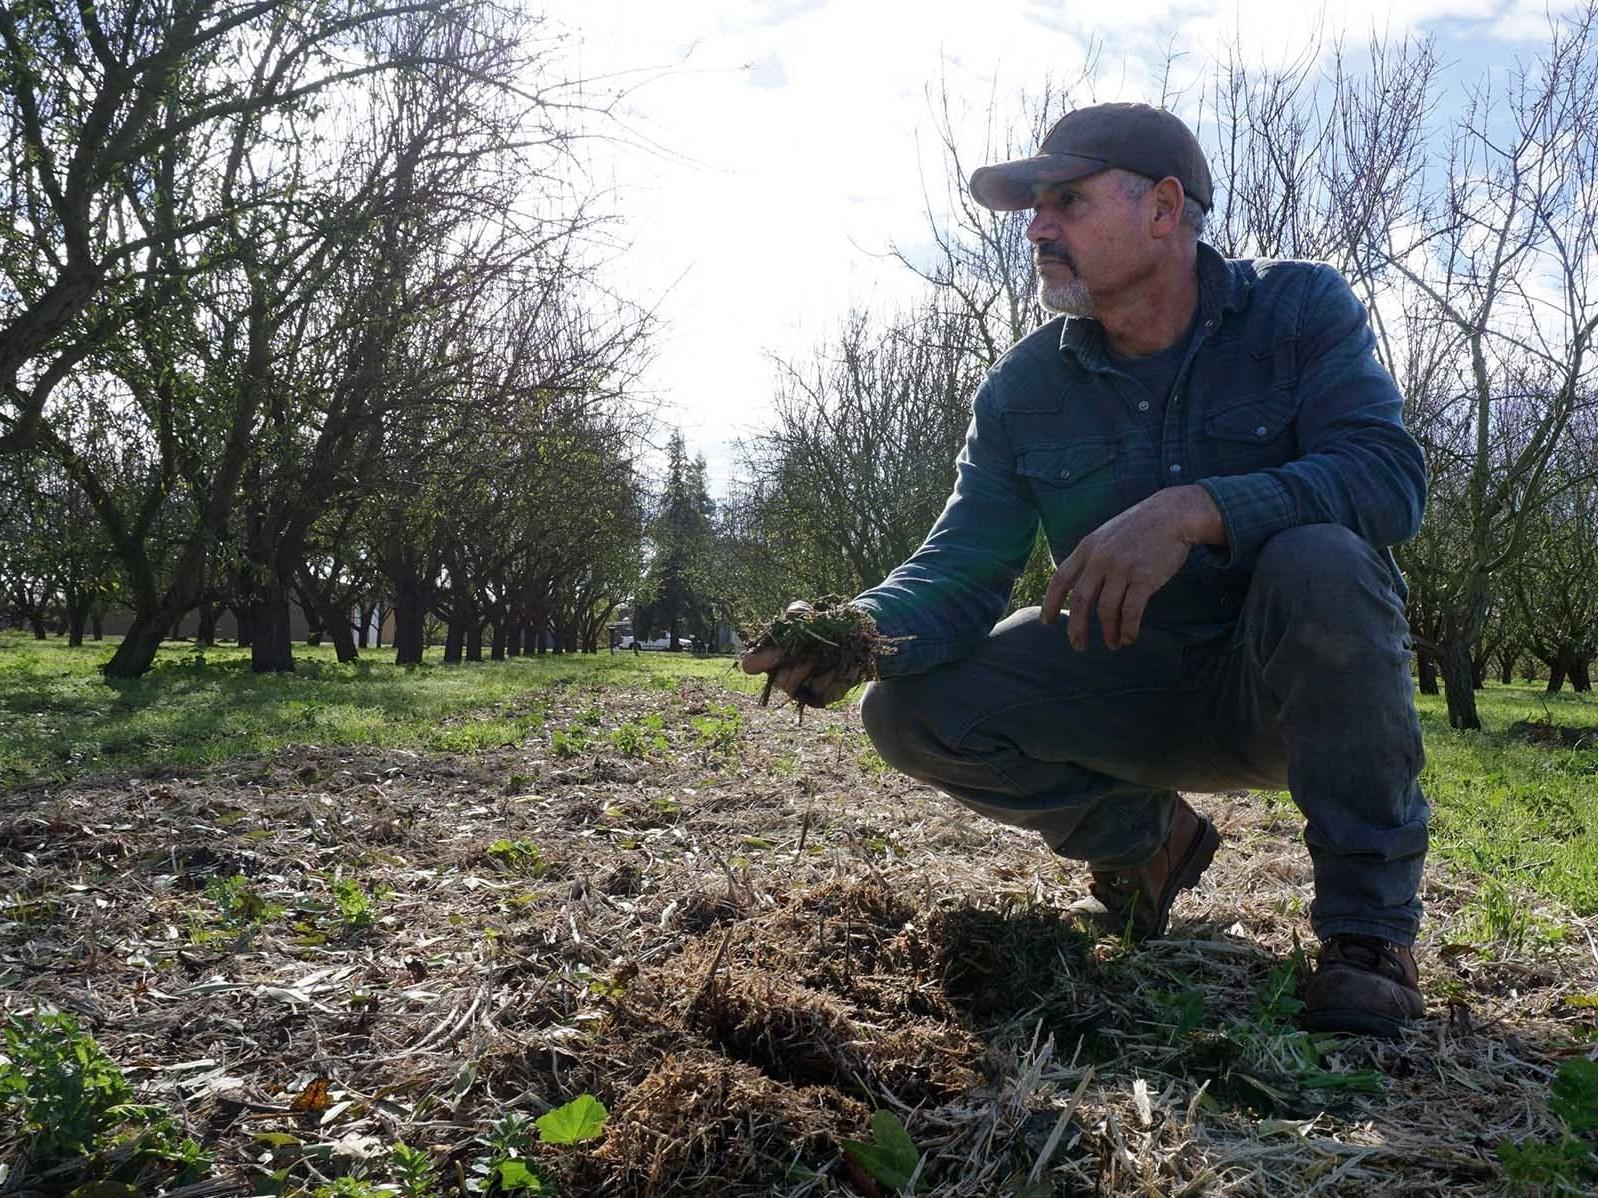 California's Latest Weapon Against Climate Change Is Low-Tech Farm Soil